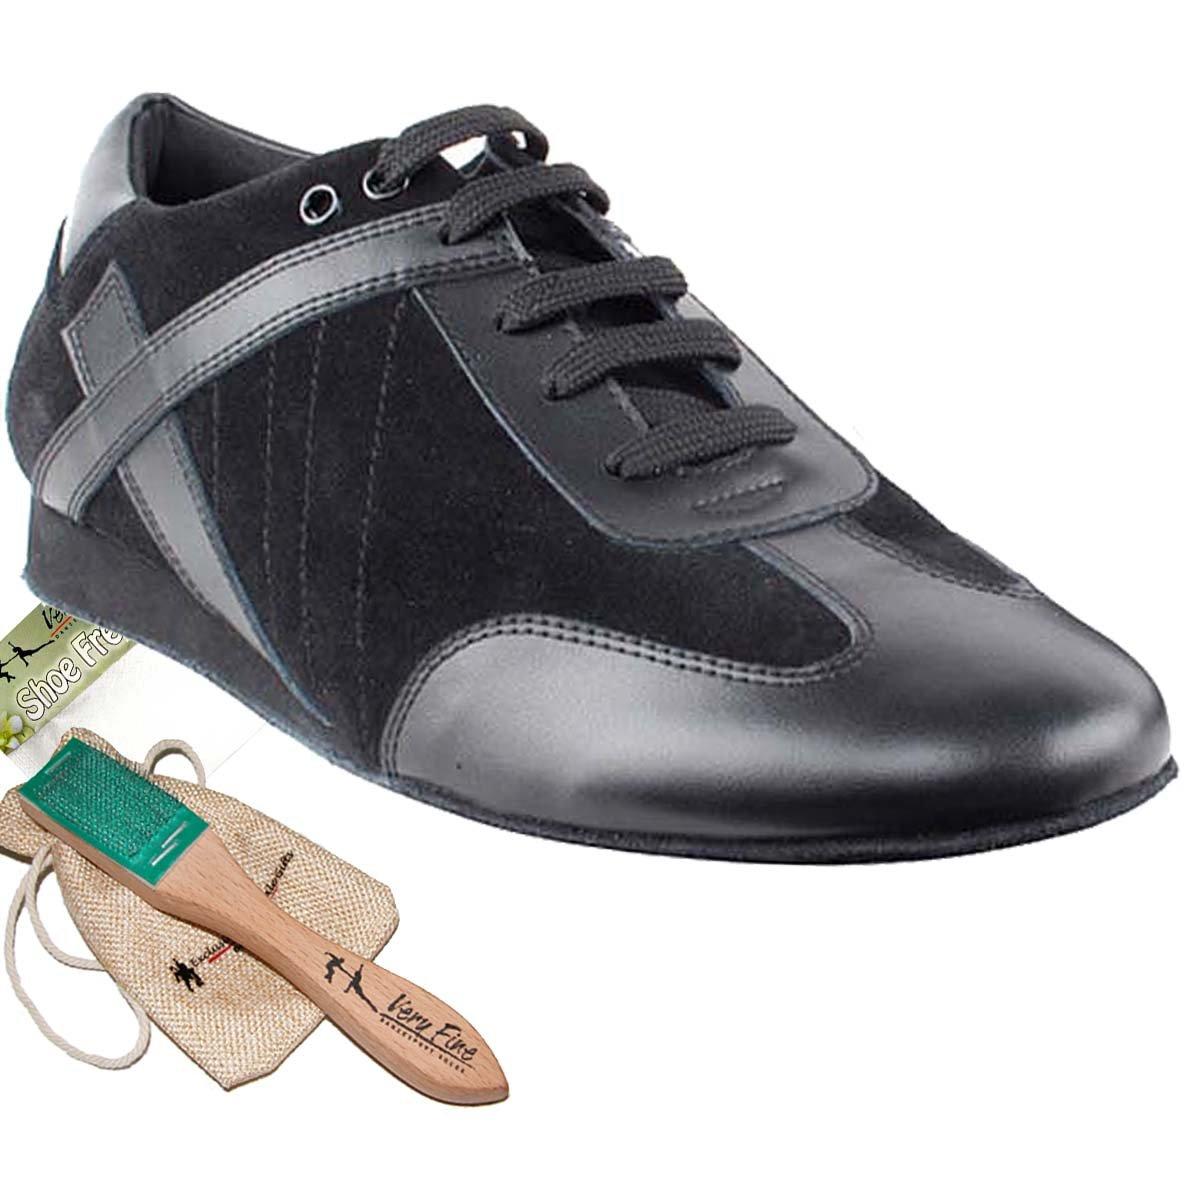 Men's Ballroom Latin Salsa Sneaker Dance Shoes Leather Black SERO106BBXEB Comfortable - Very Fine 10.5 M US [Bundle of 5]